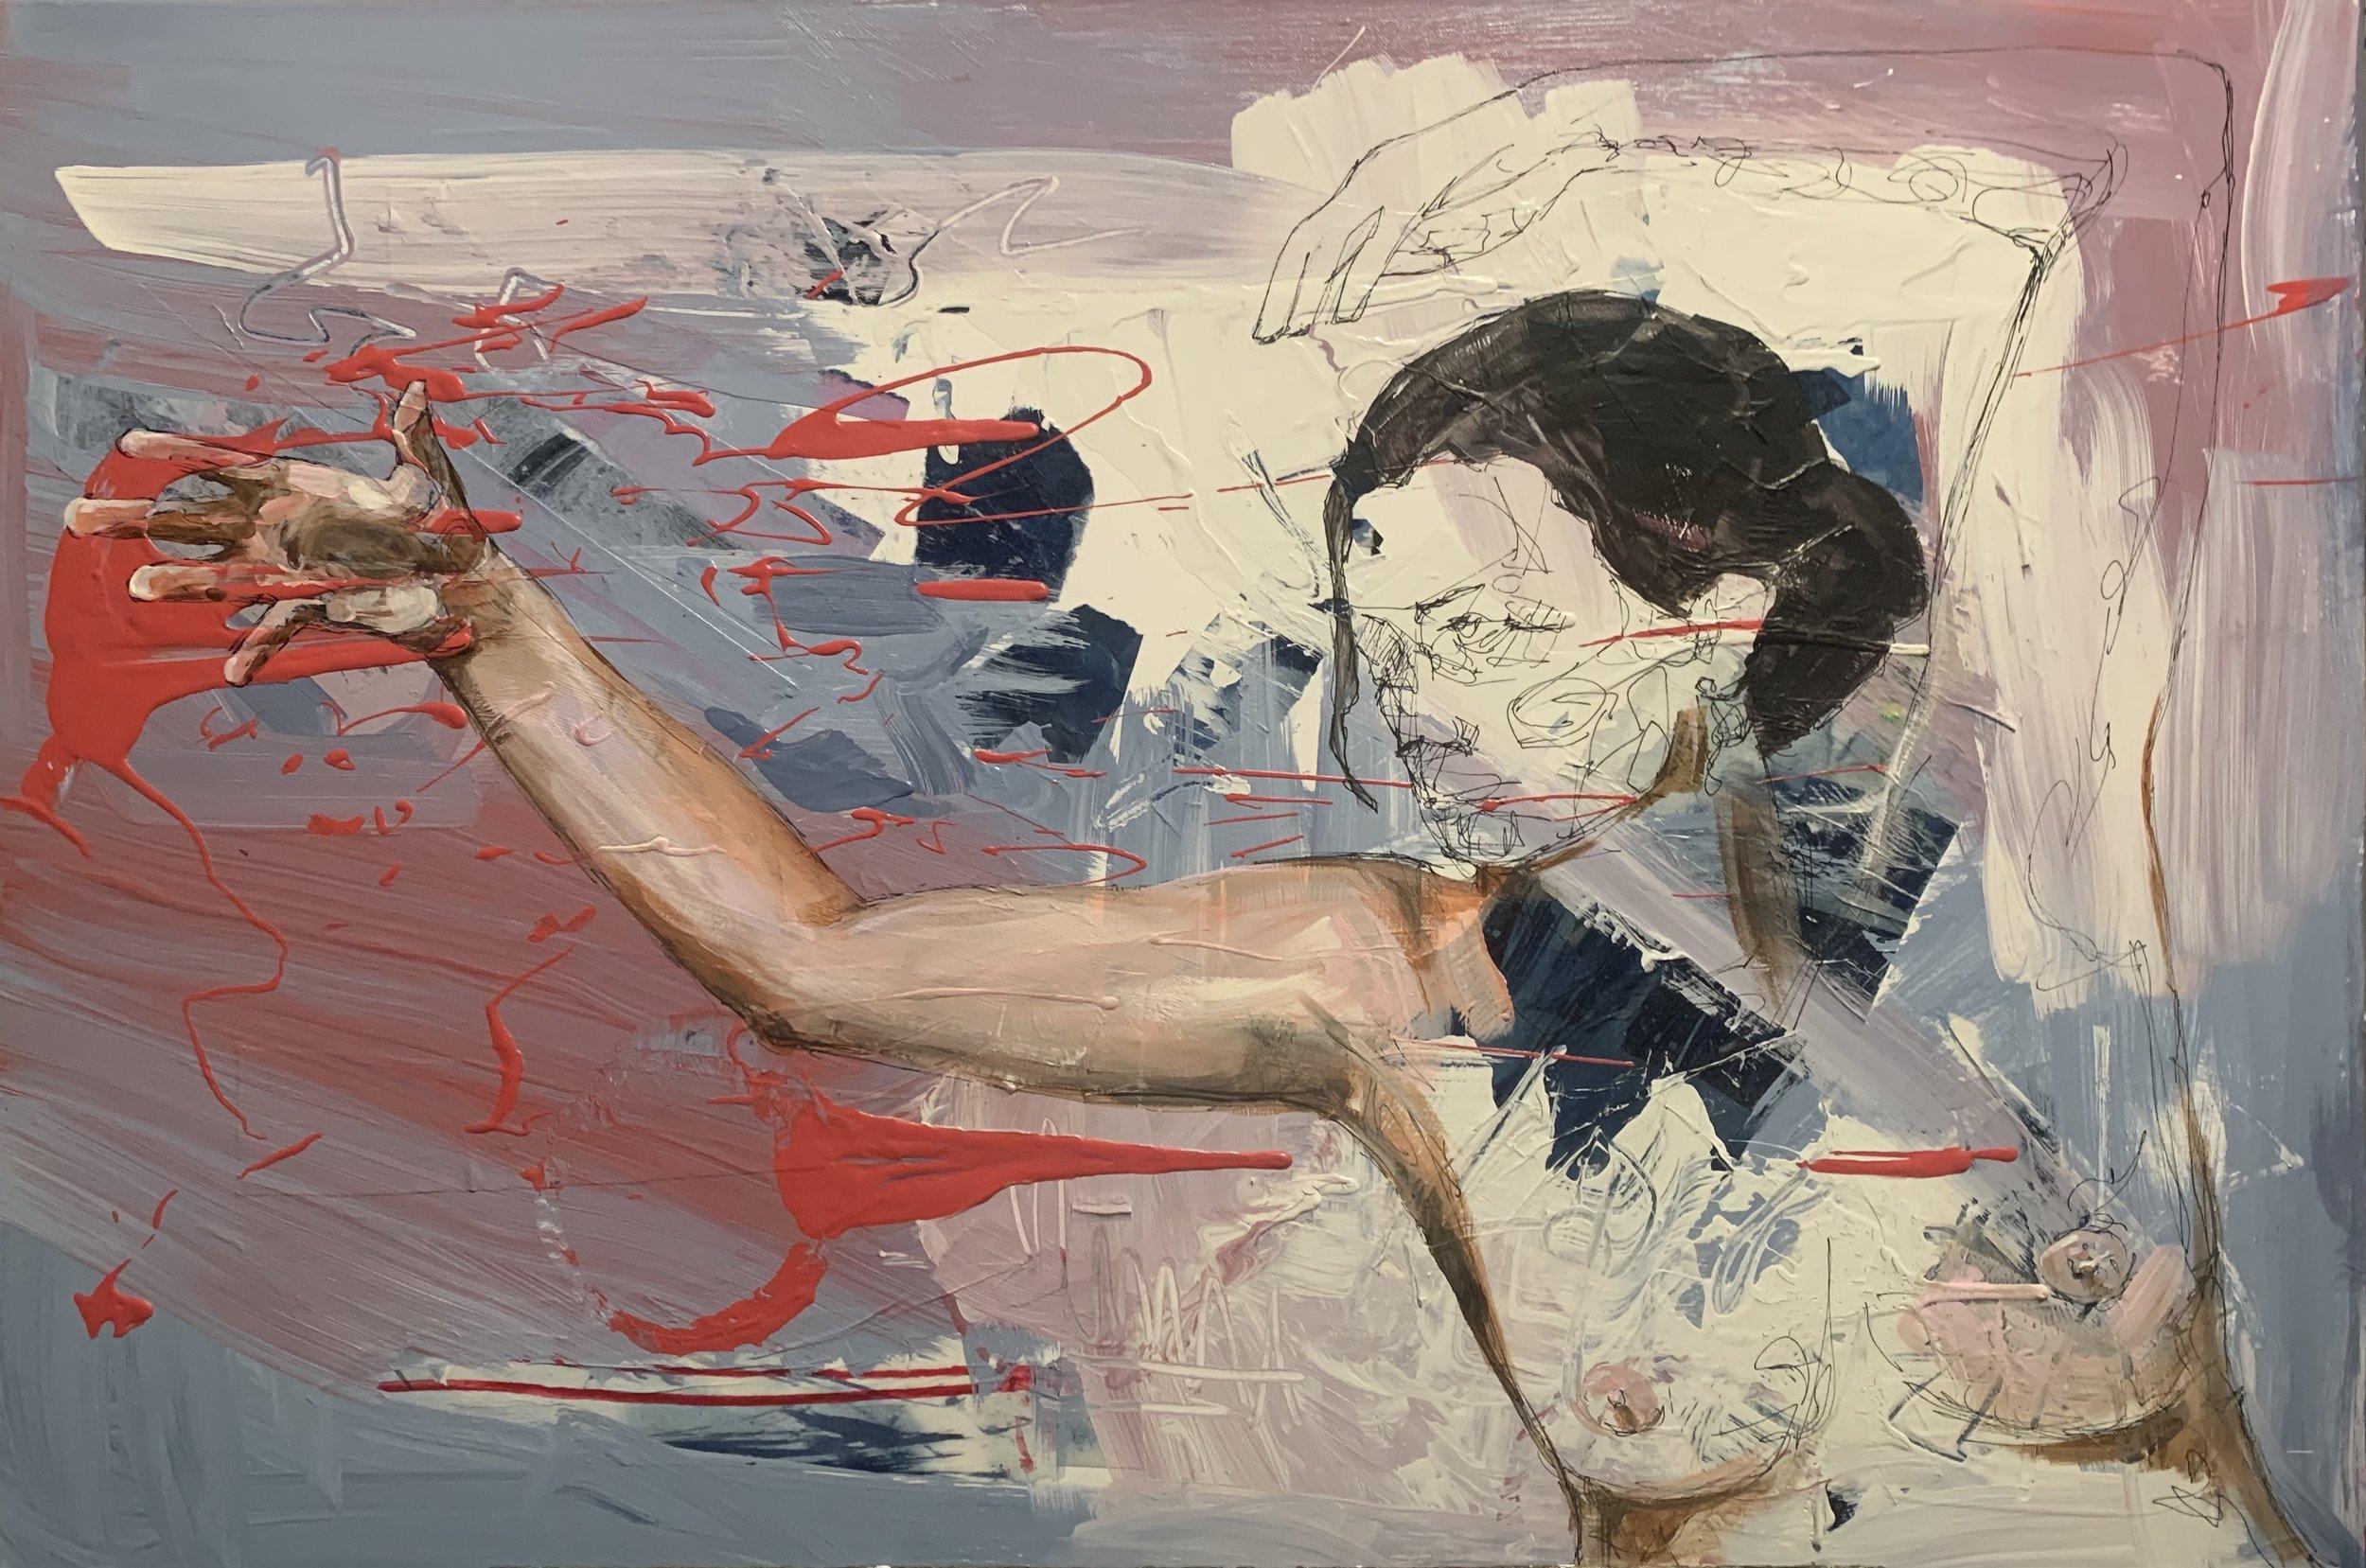 "Electric by Krista M. Jones  Medium: Mixed Media on Canvas  Size:36"" x 24'  Contact Krista for inquiries at  https://www.jonesyartatl.com/contact"